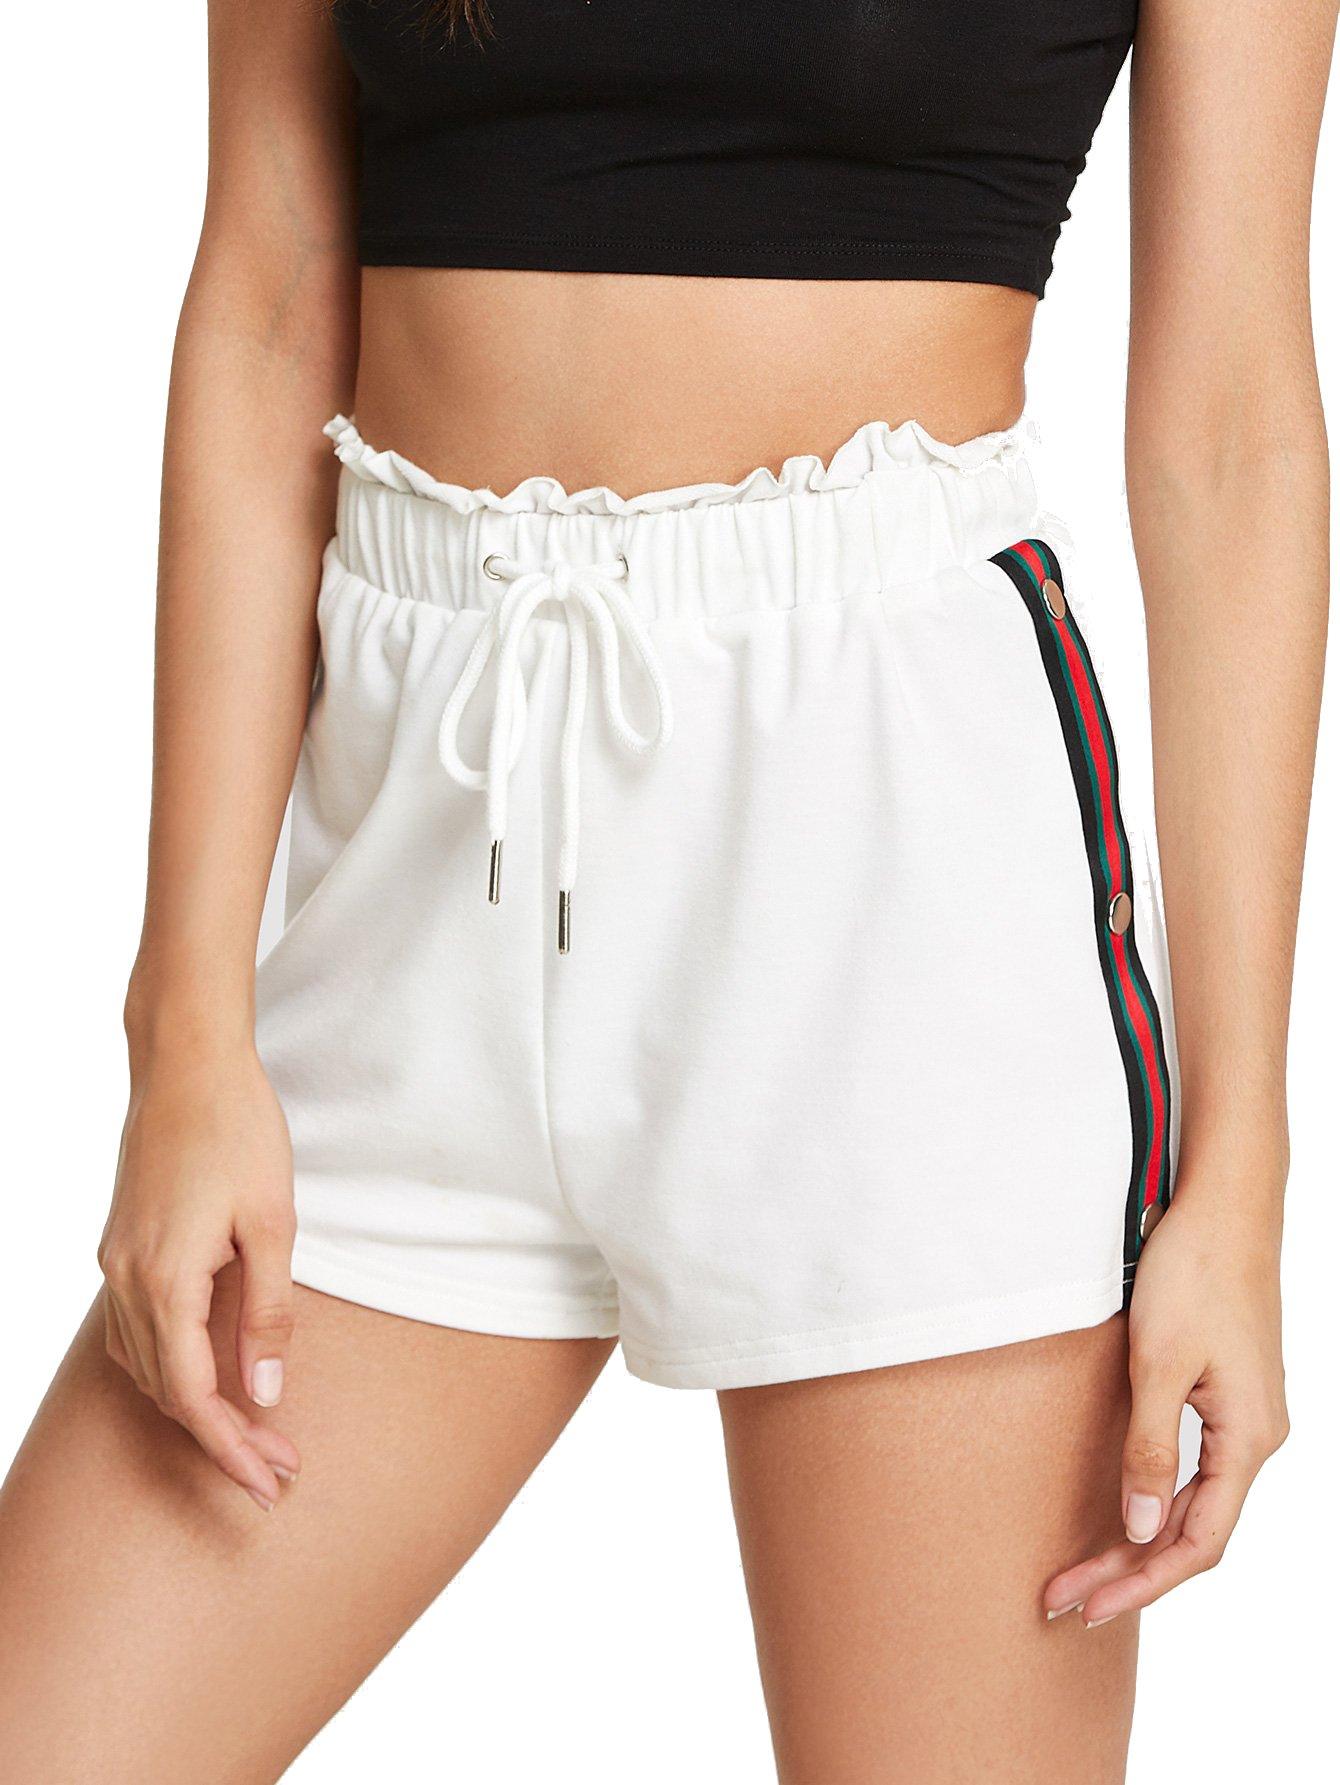 SweatyRocks Women Summer Casual Sports Workout Shorts Drawstring Elastic Waiste Hot Shorts White S by SweatyRocks (Image #2)